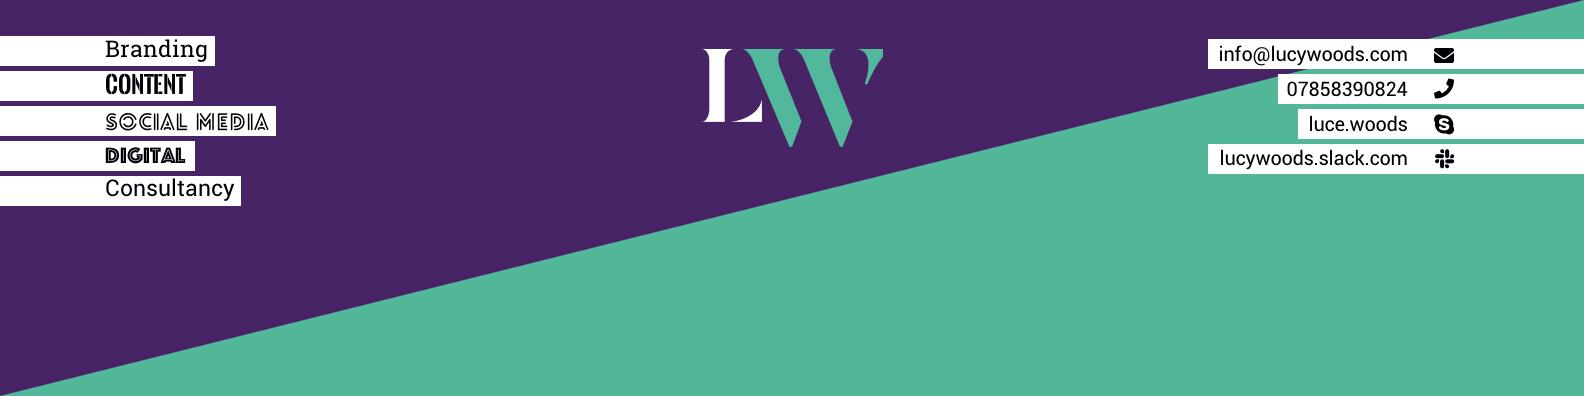 LW Marketing - Linkedin cover image.jpg